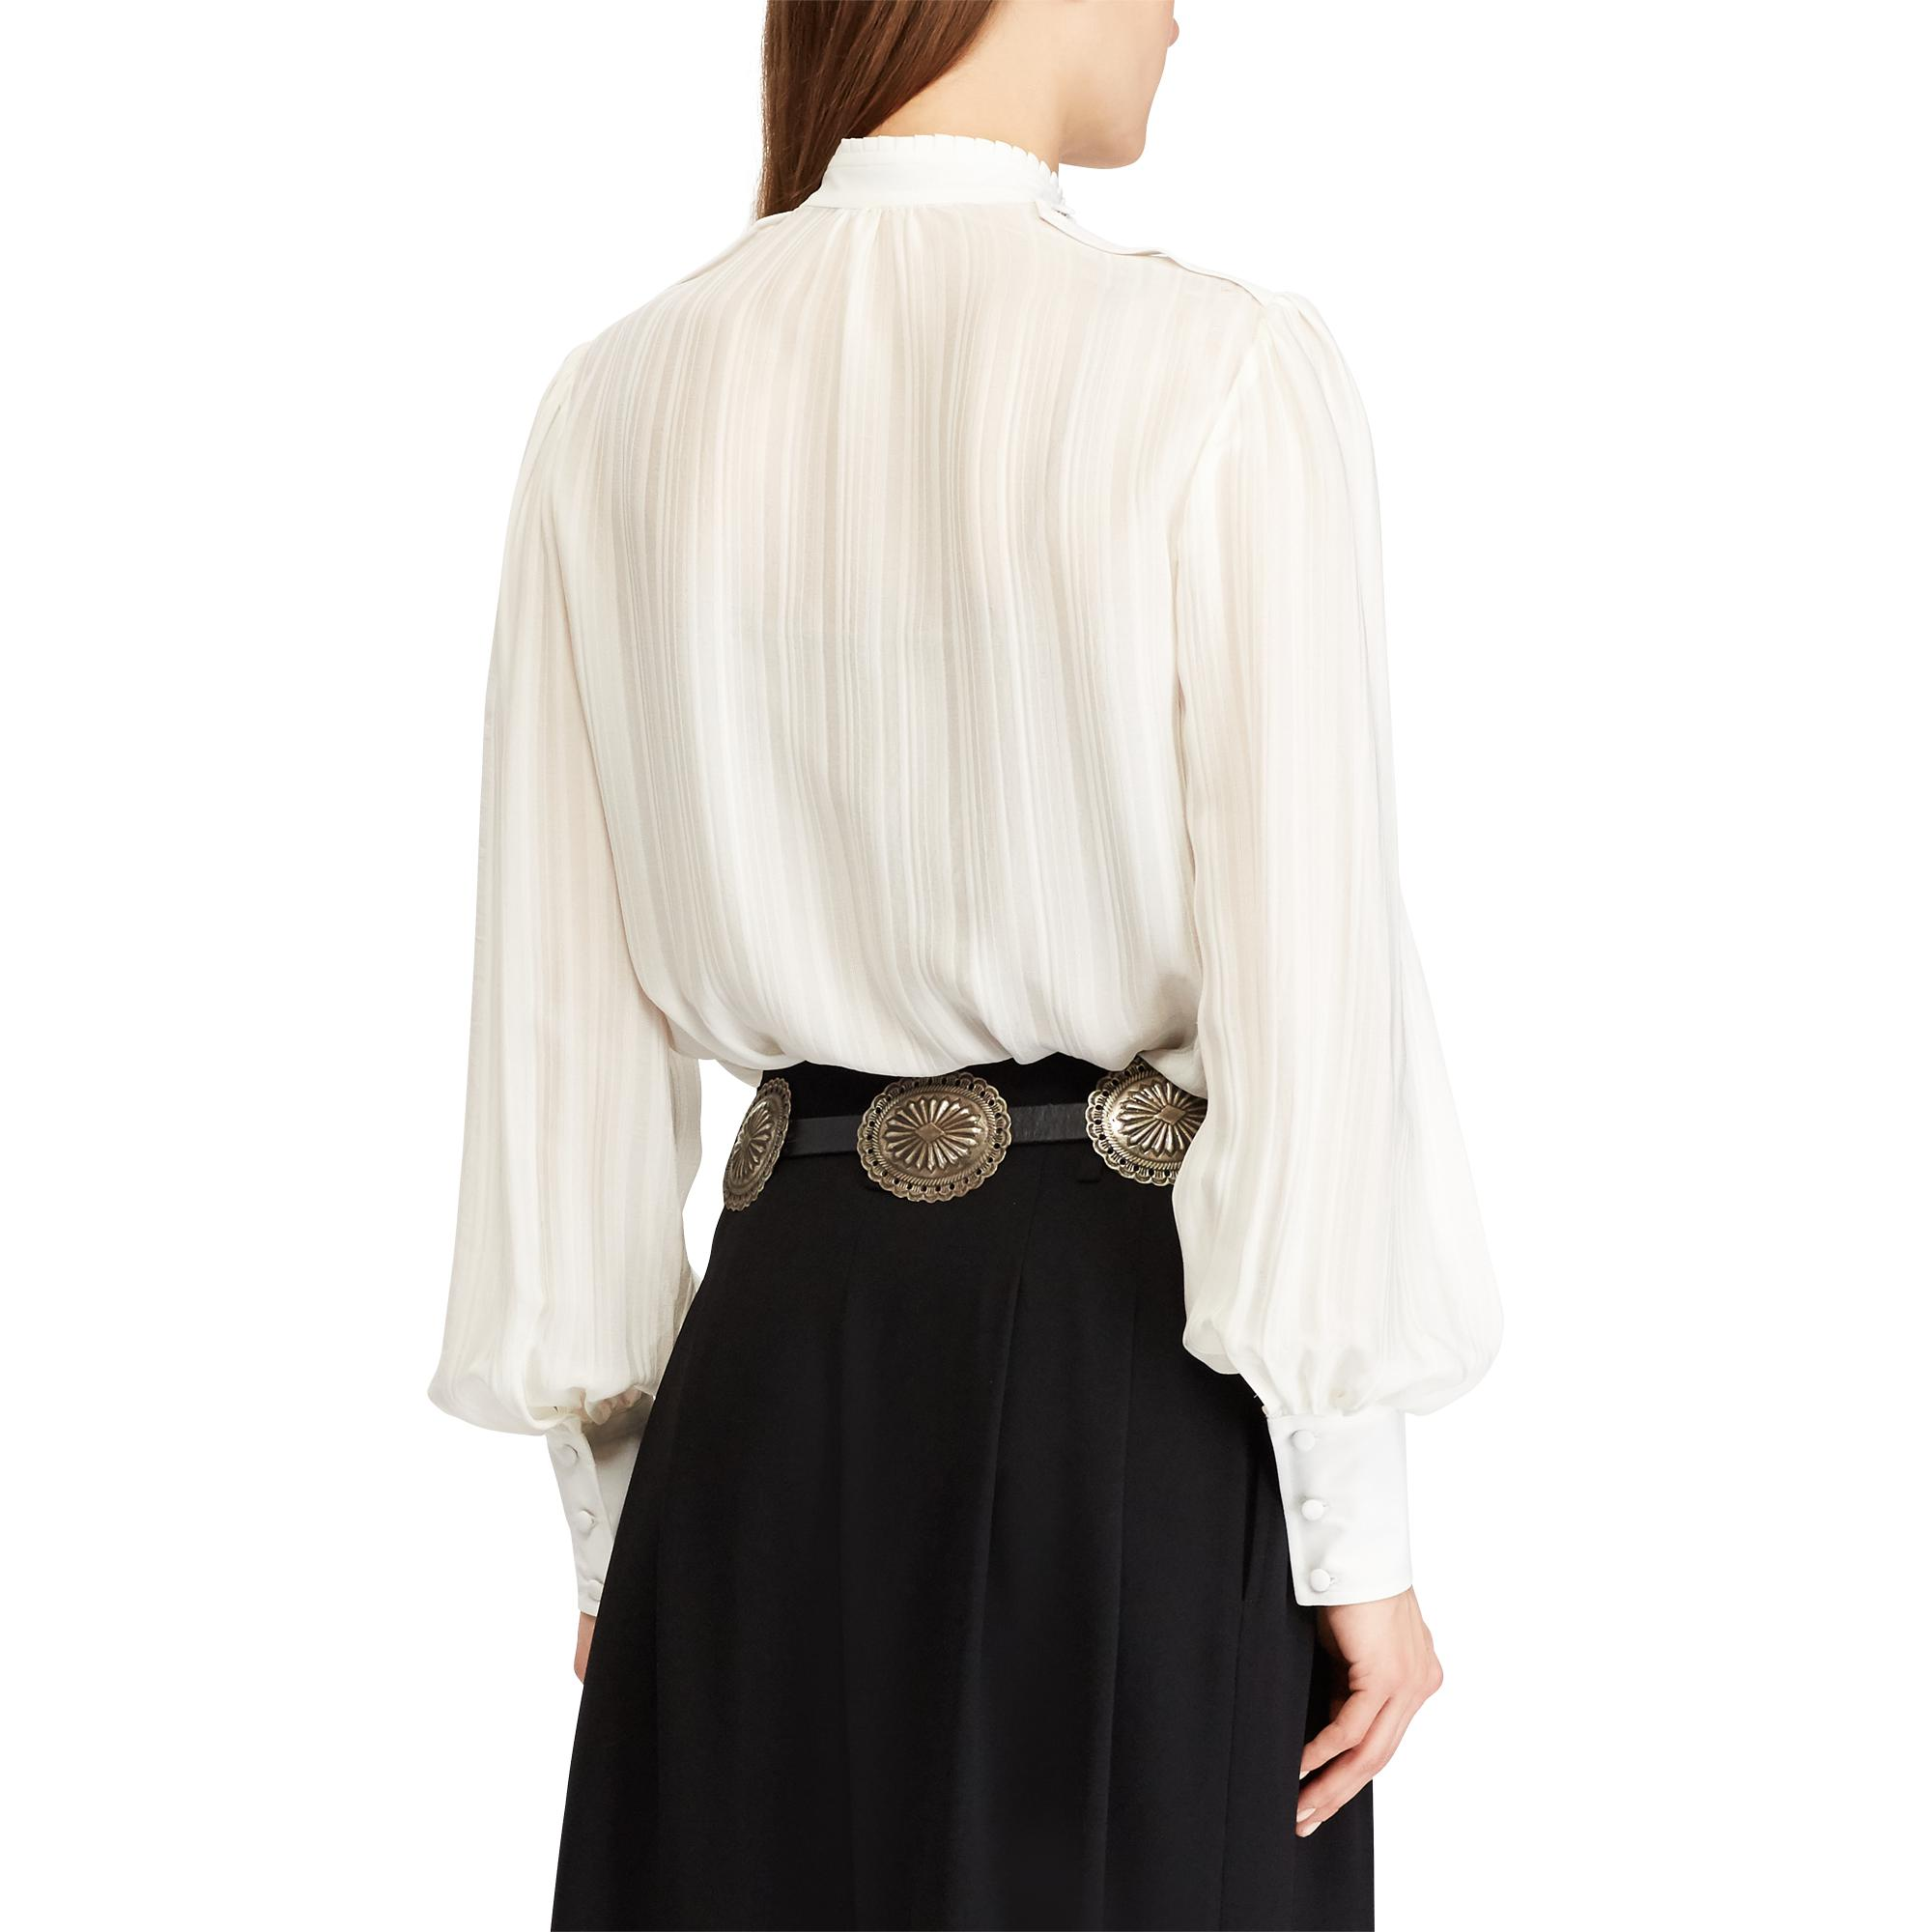 489343d94961f0 Lyst - Polo Ralph Lauren Jacquard-stripe Silk Blouse in White